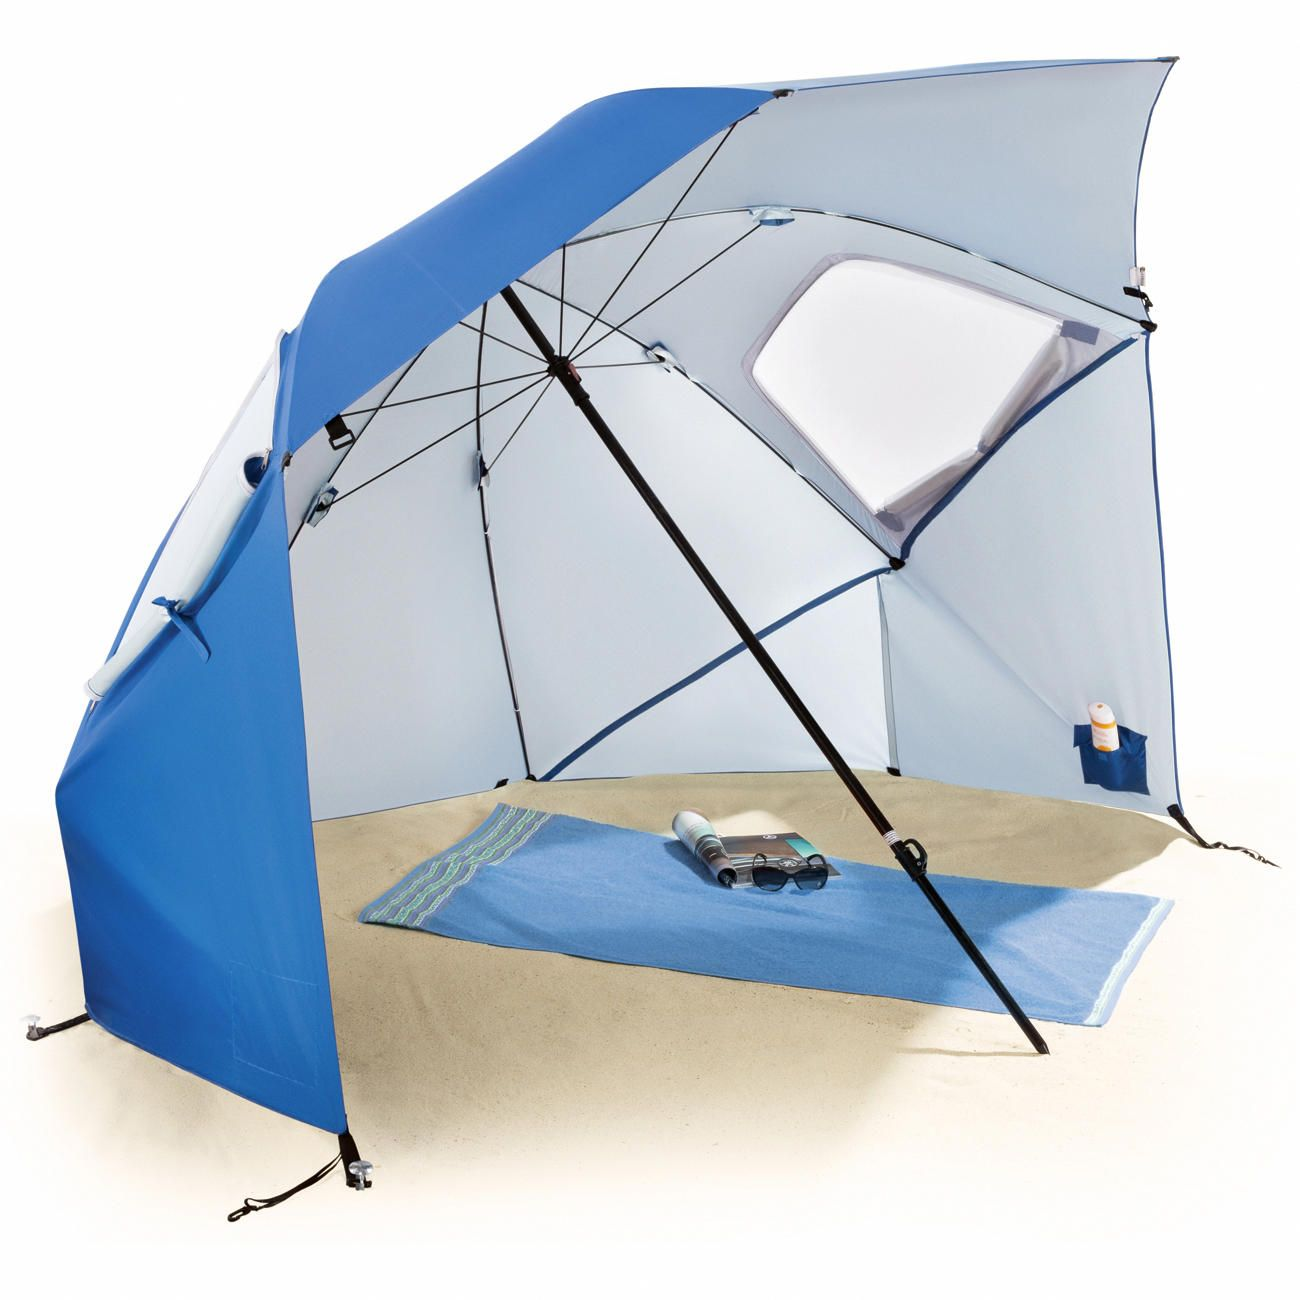 SuperBrella For the beach, camping, picnics, sports